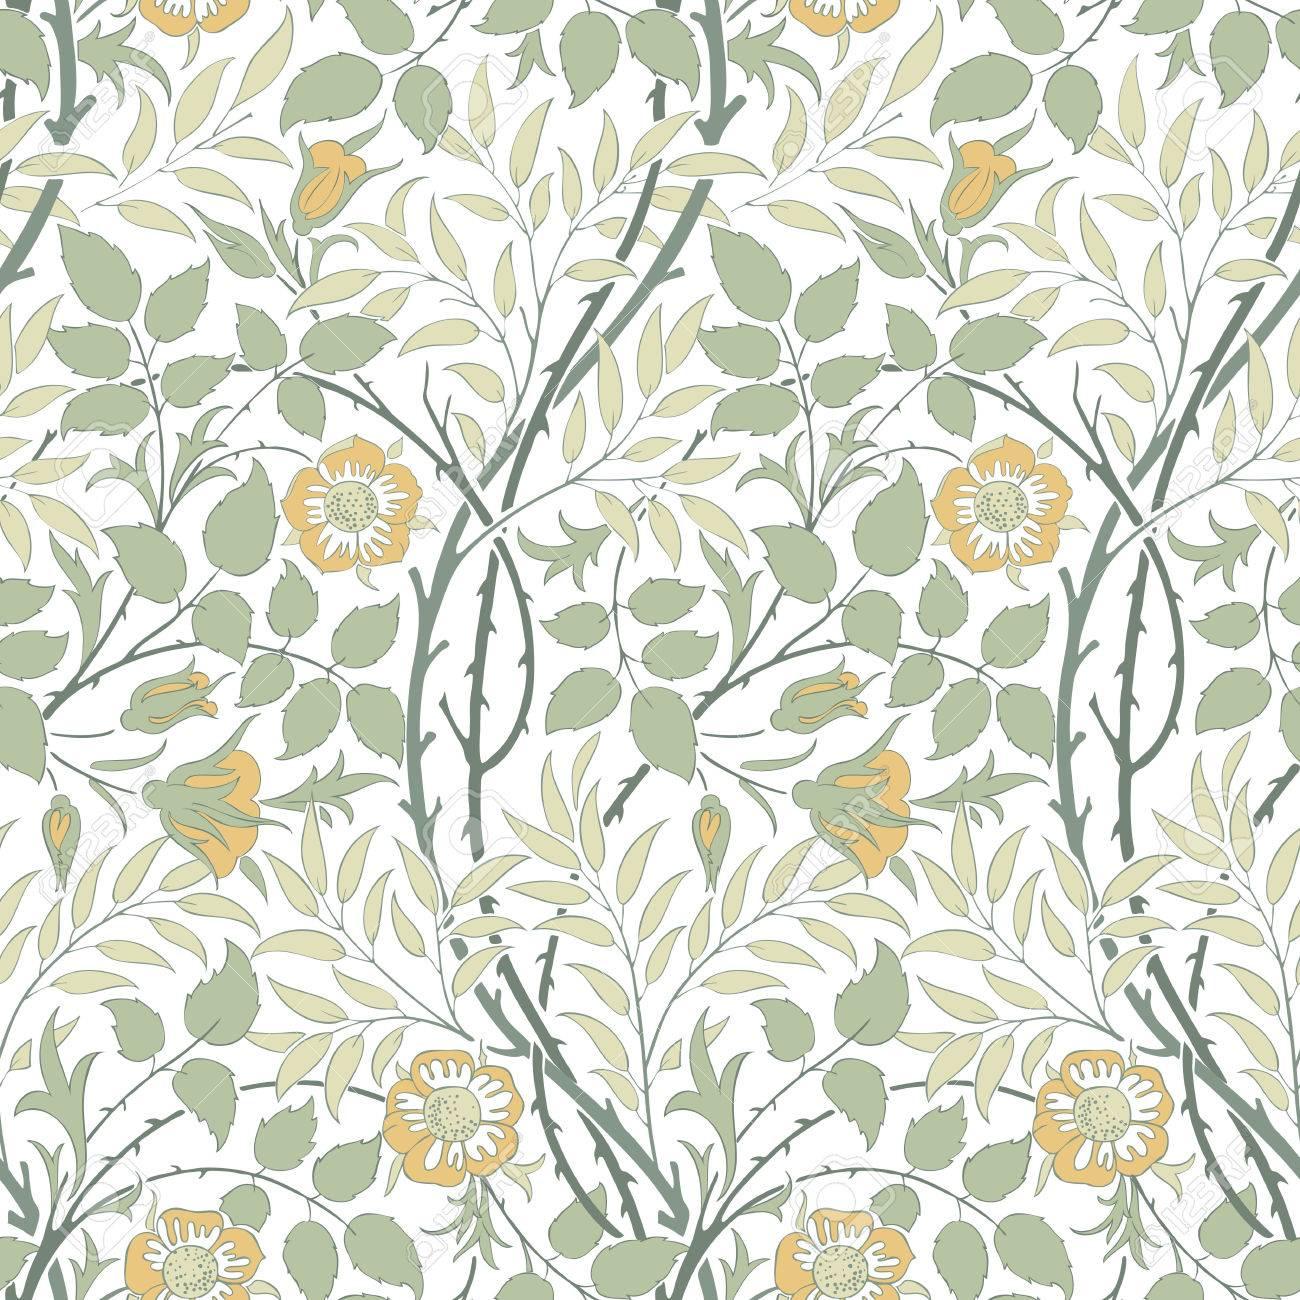 modern fabric design pattern desktop wallpaper background rh 123rf com